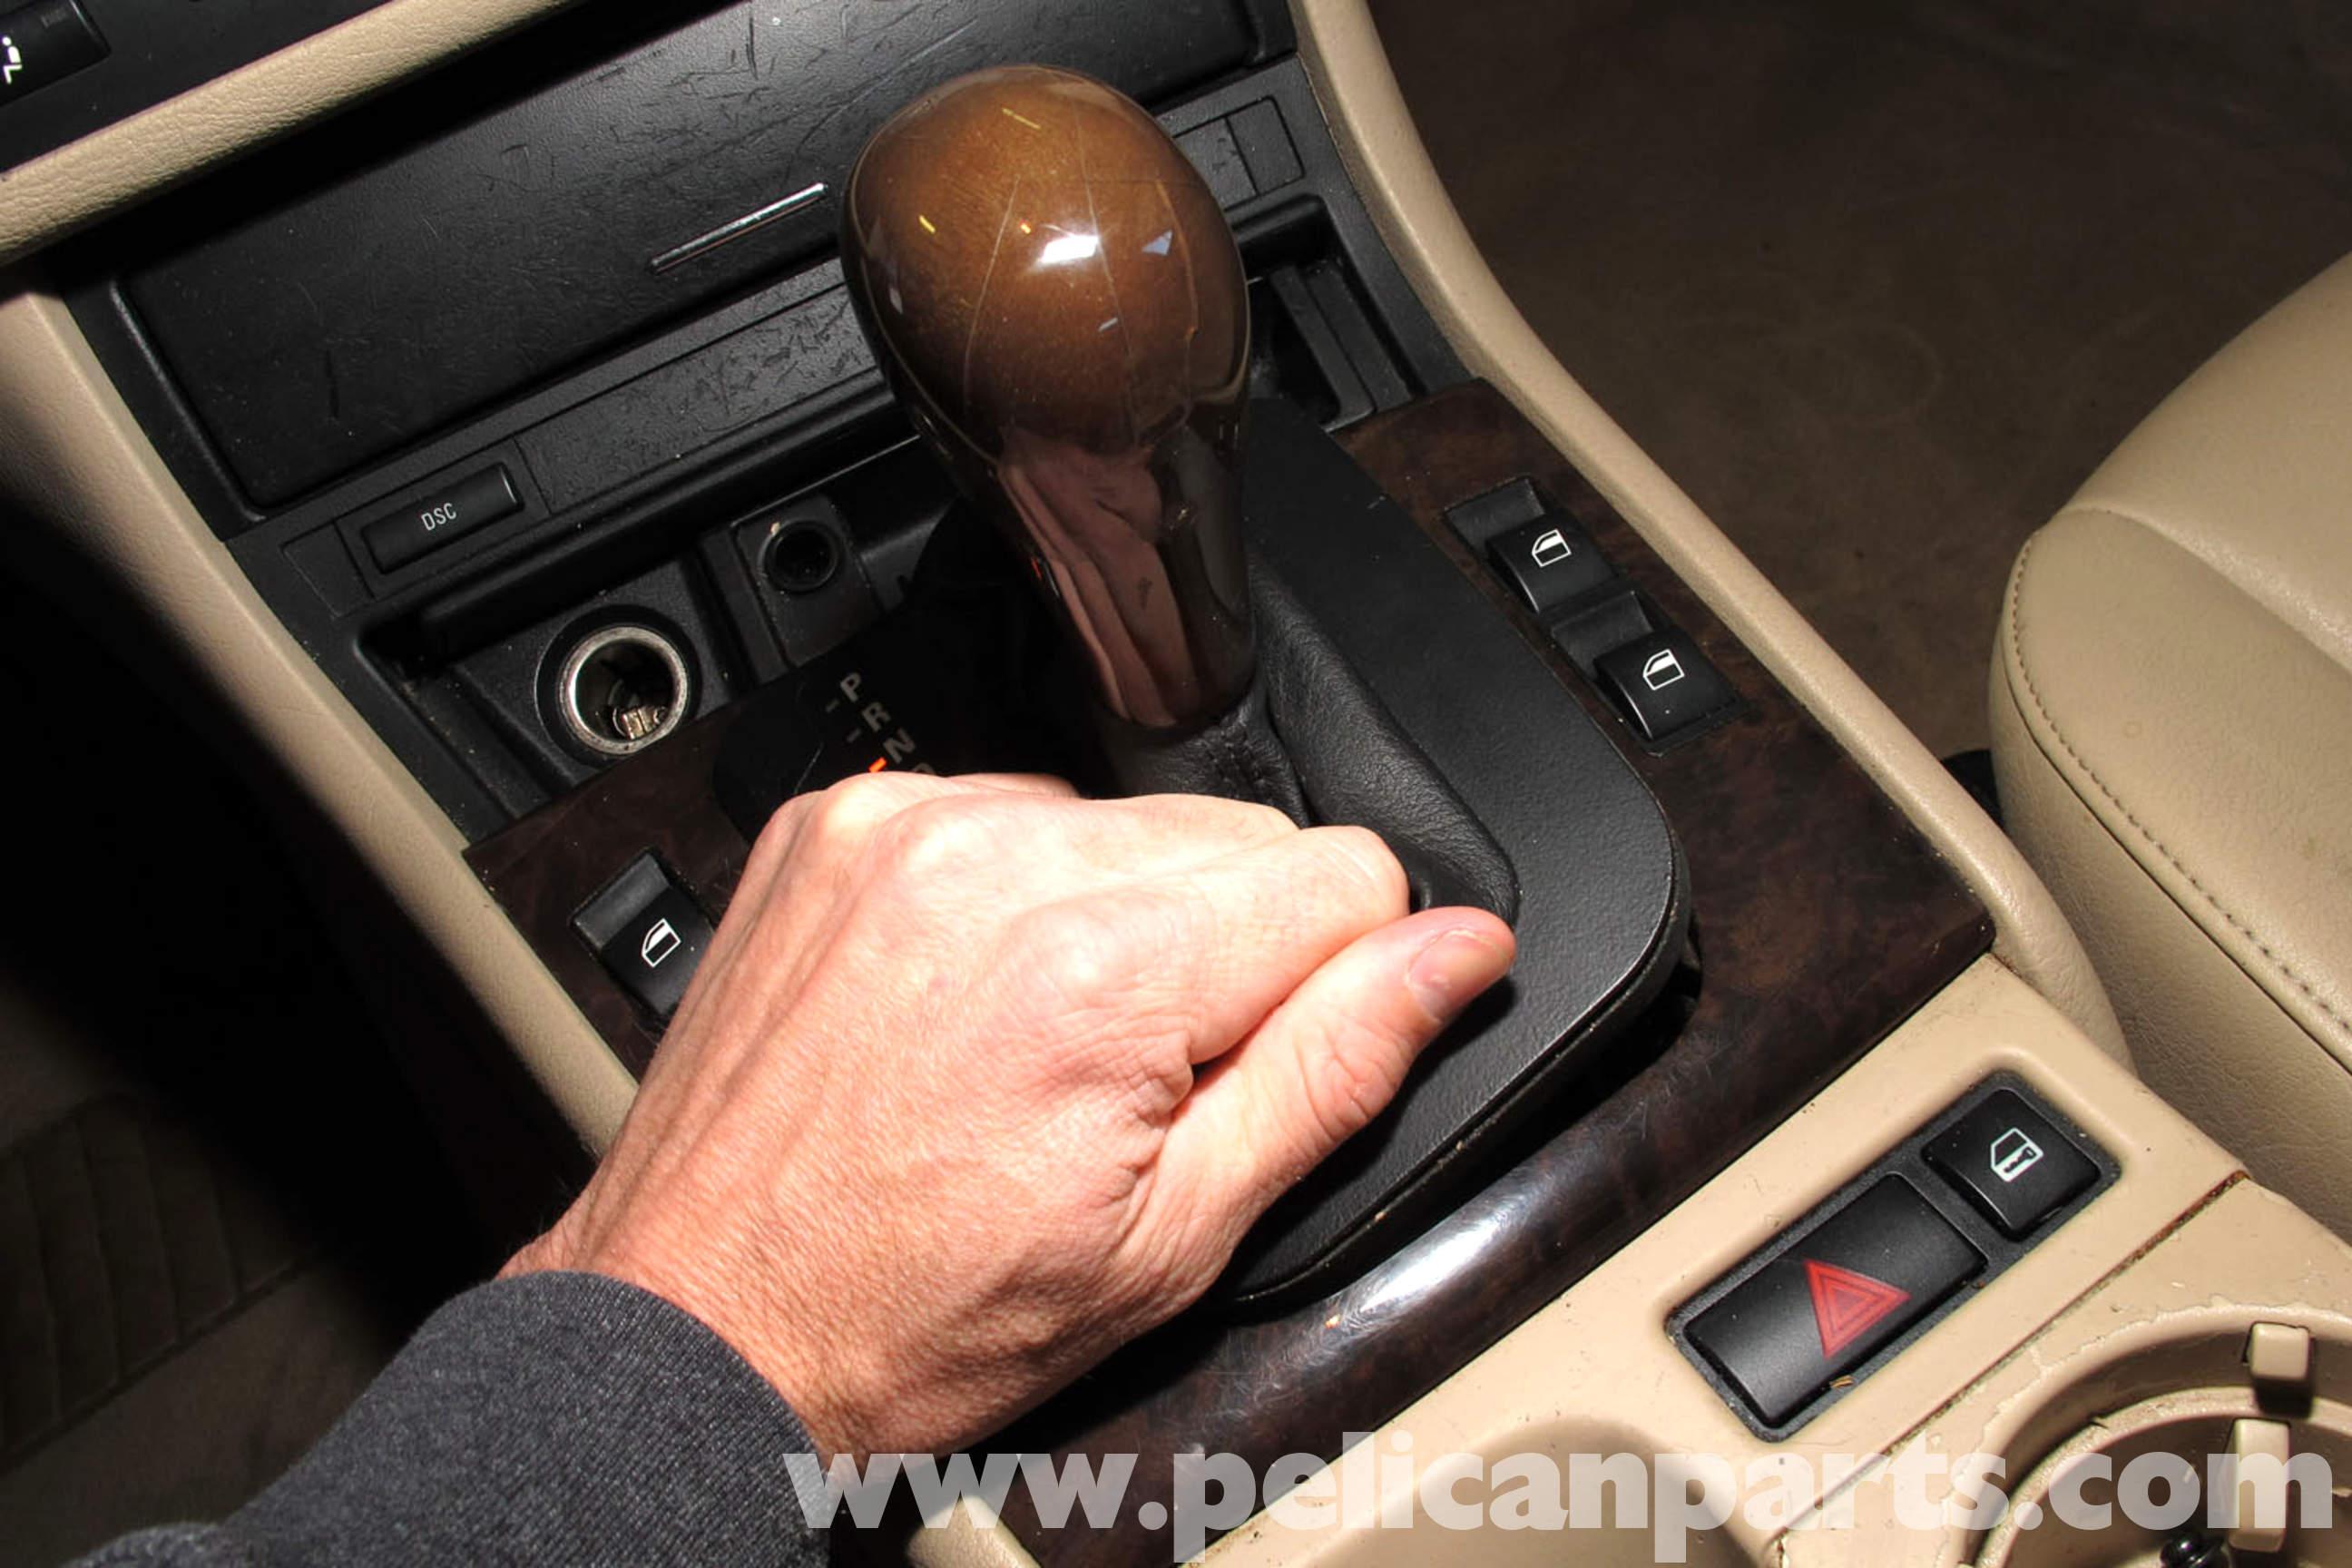 Bmw E46 Gear Shift Boot Replacement Bmw 325i 2001 2005 Bmw 325xi 2001 2005 Bmw 325ci